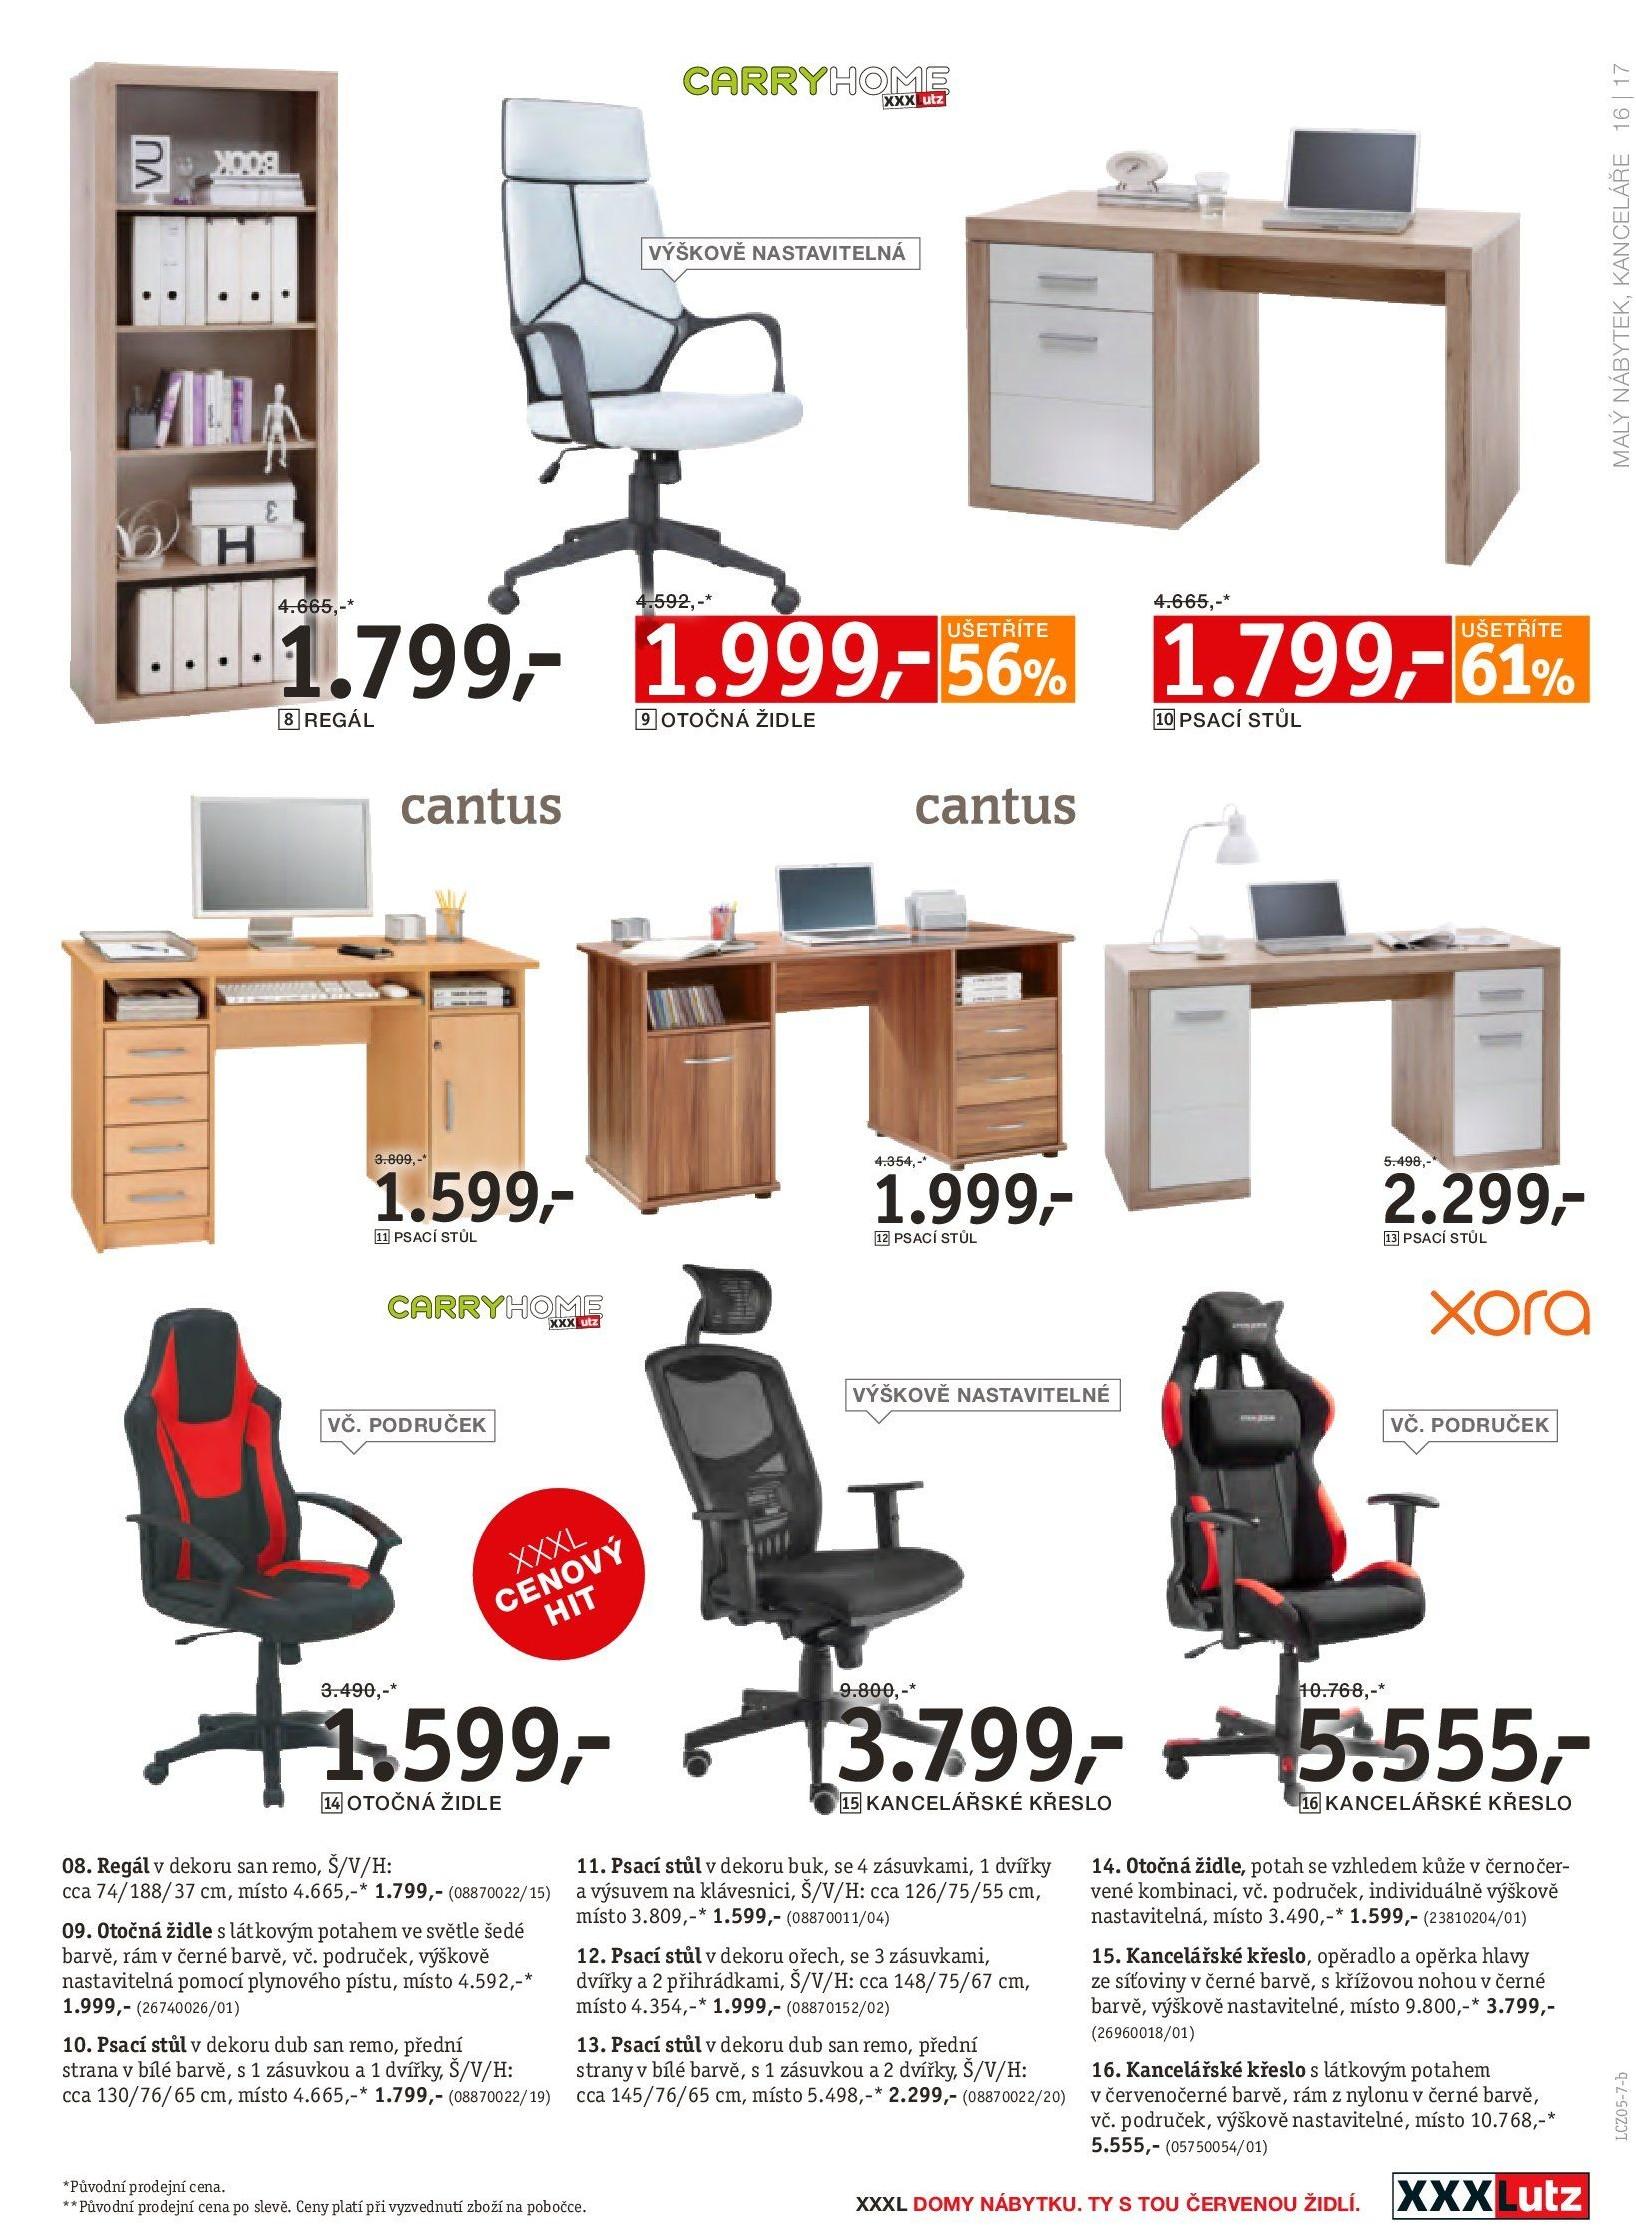 katalog xxxlutz od 1 5. Black Bedroom Furniture Sets. Home Design Ideas